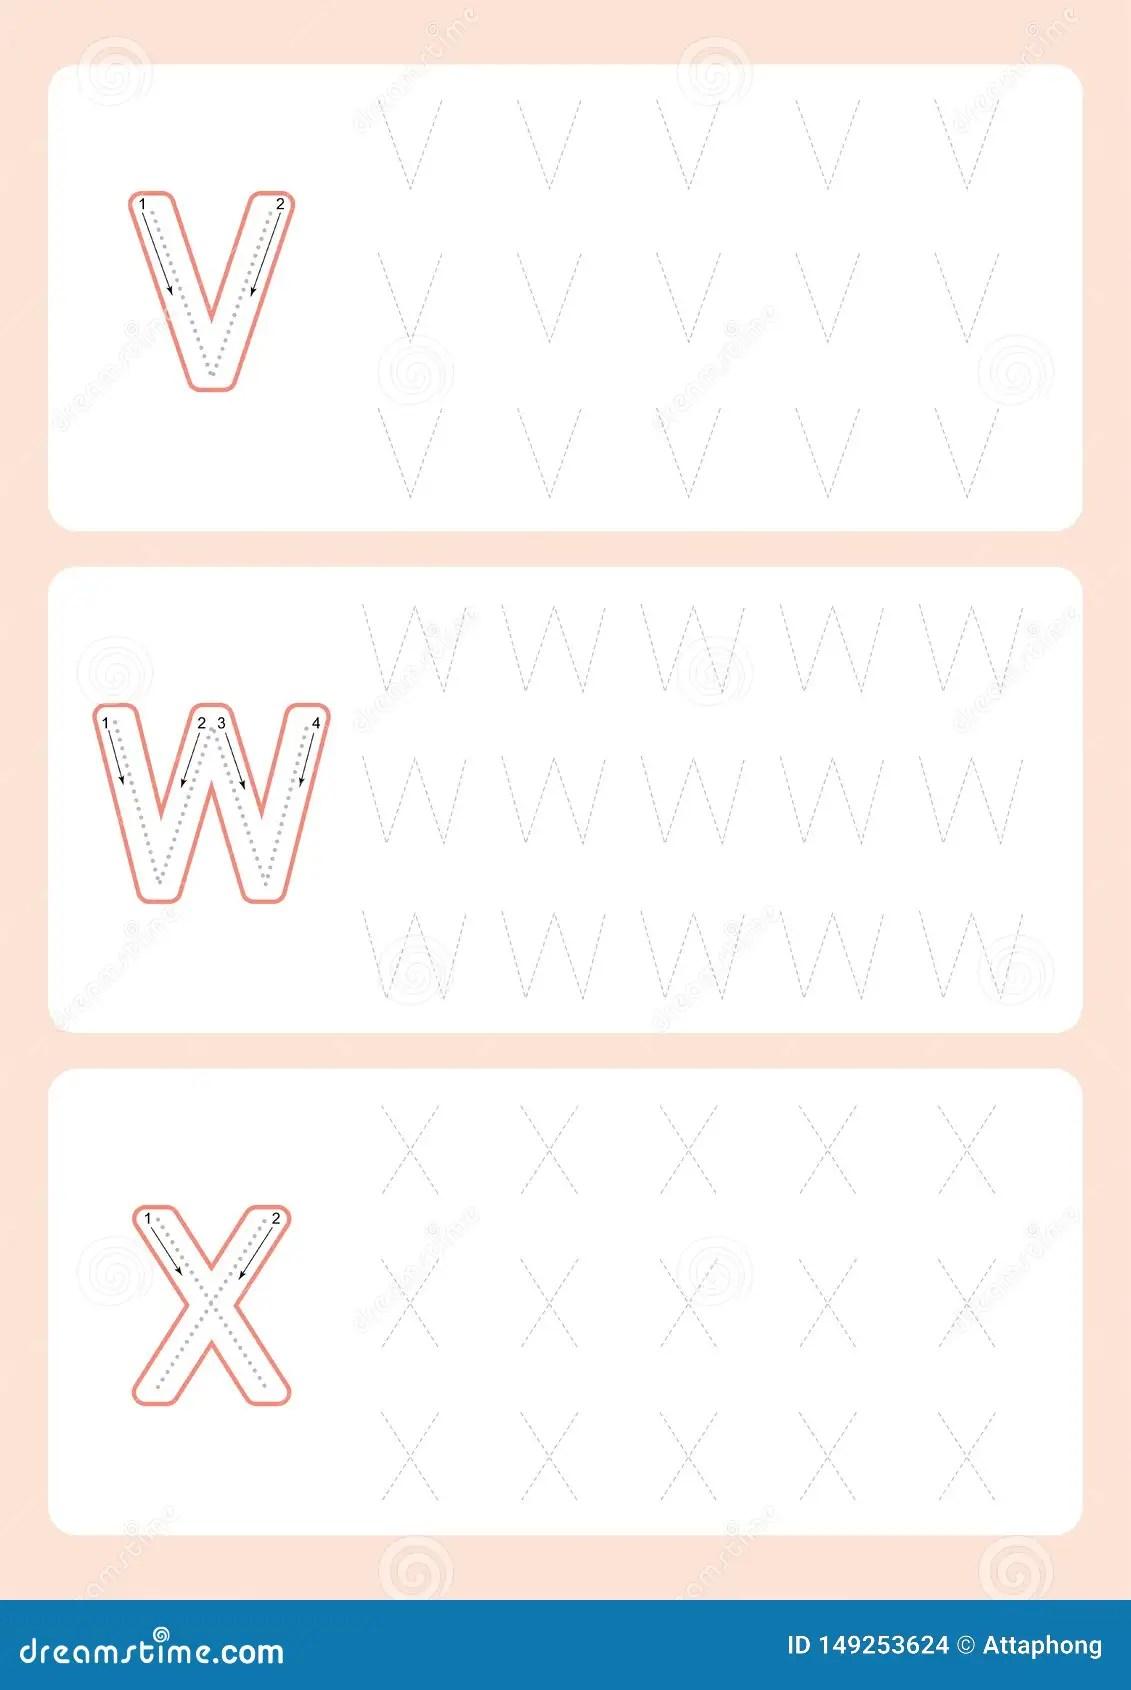 Kindergarten Tracing Letters Worksheets Alphabet Trace